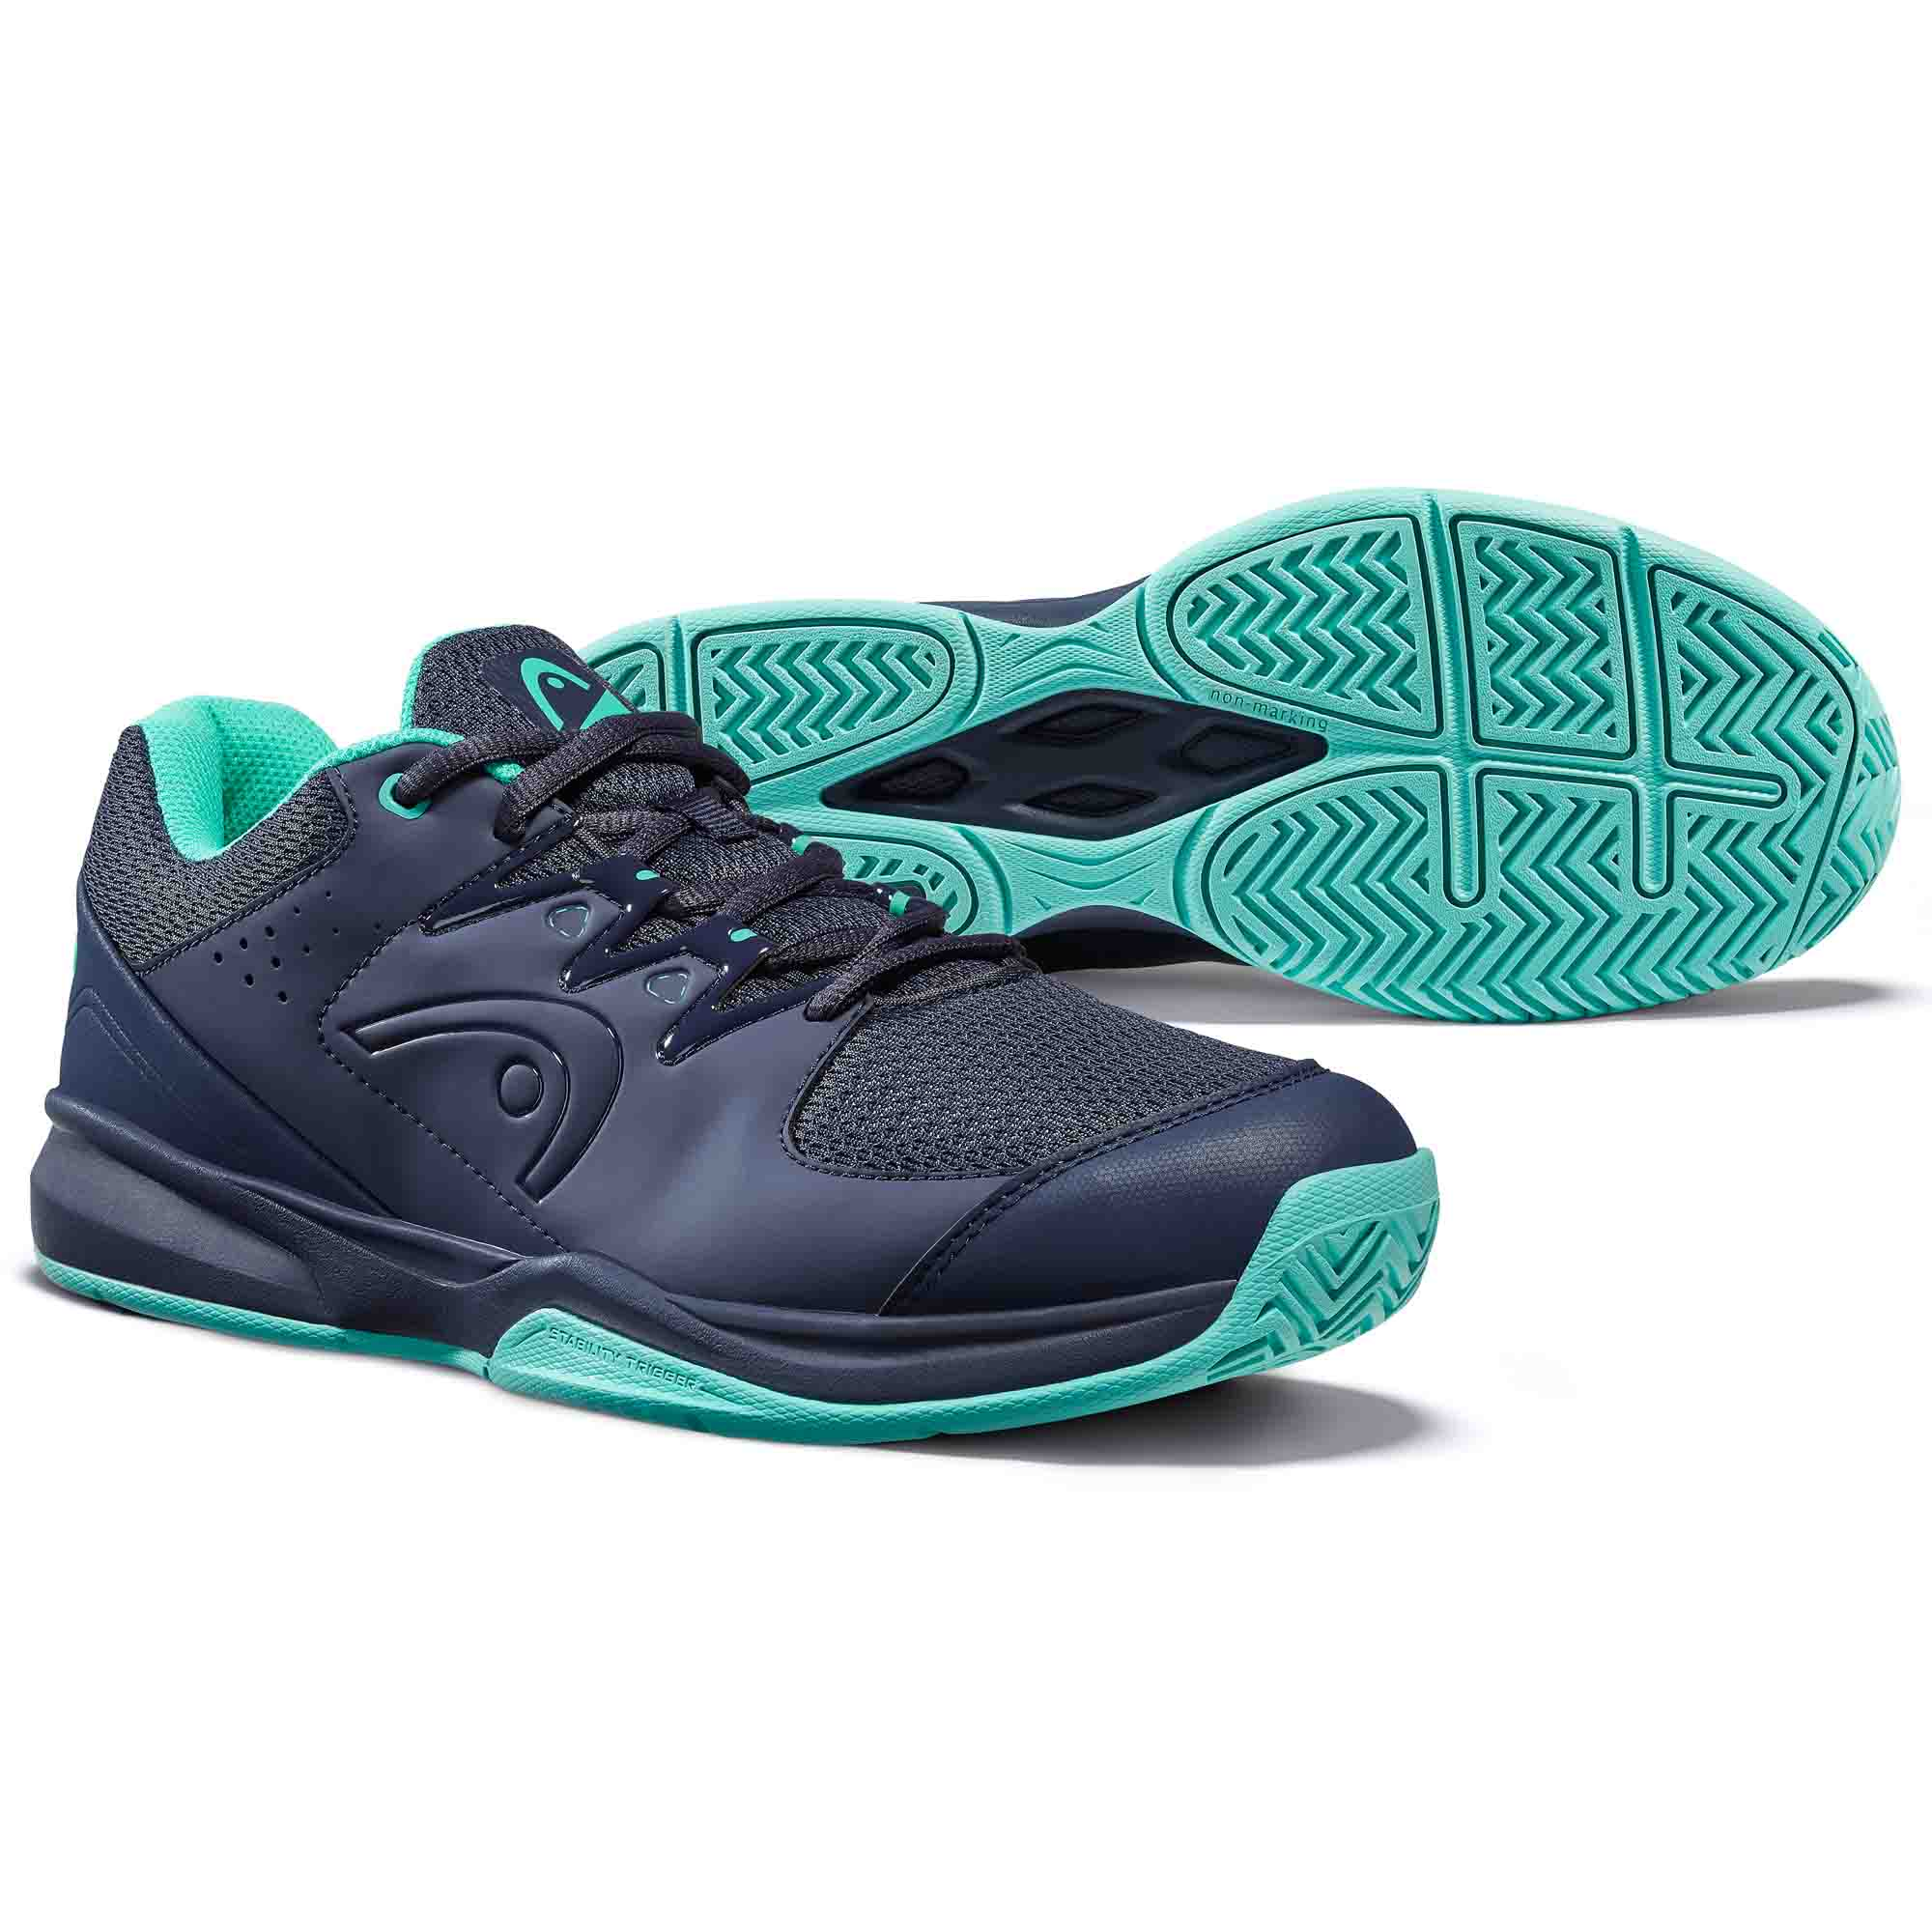 Head Brazer 2.0 Ladies Tennis Shoes - Blue, 6.5 UK